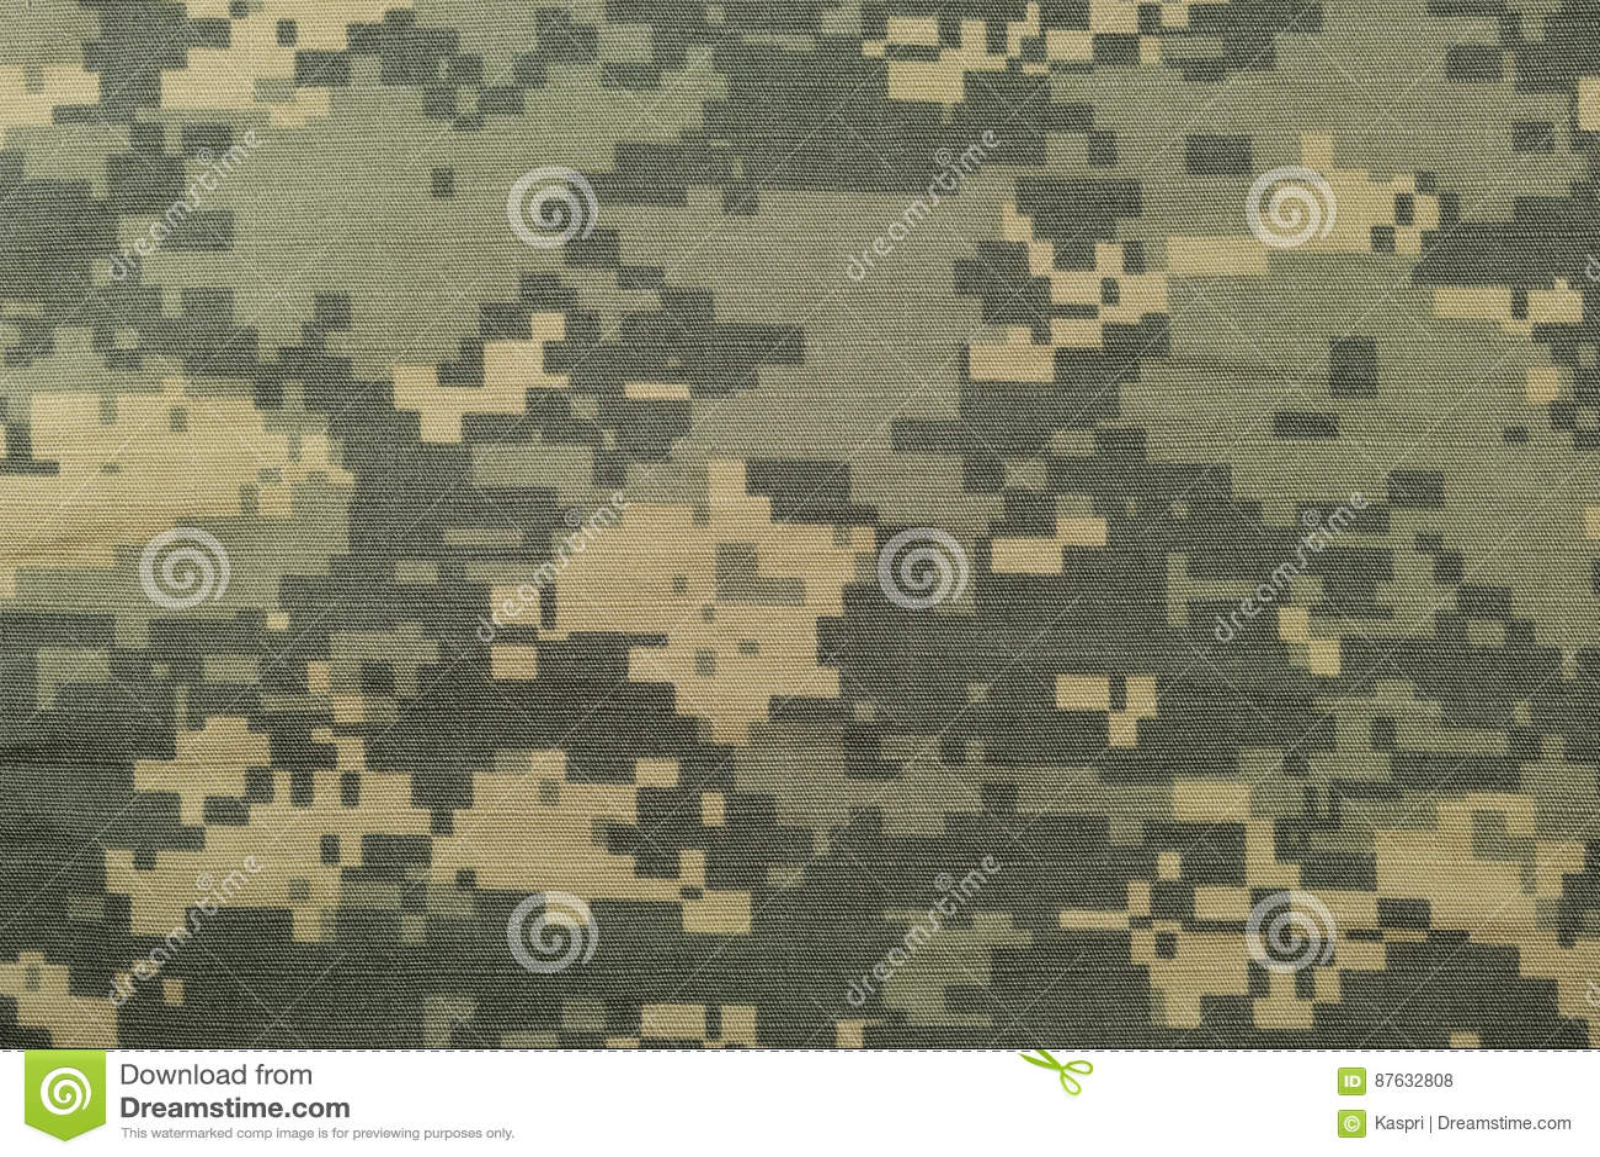 Universal camouflage pattern, army combat uniform digital camo, USA military ACU macro closeup, detailed large rip-stop fabric